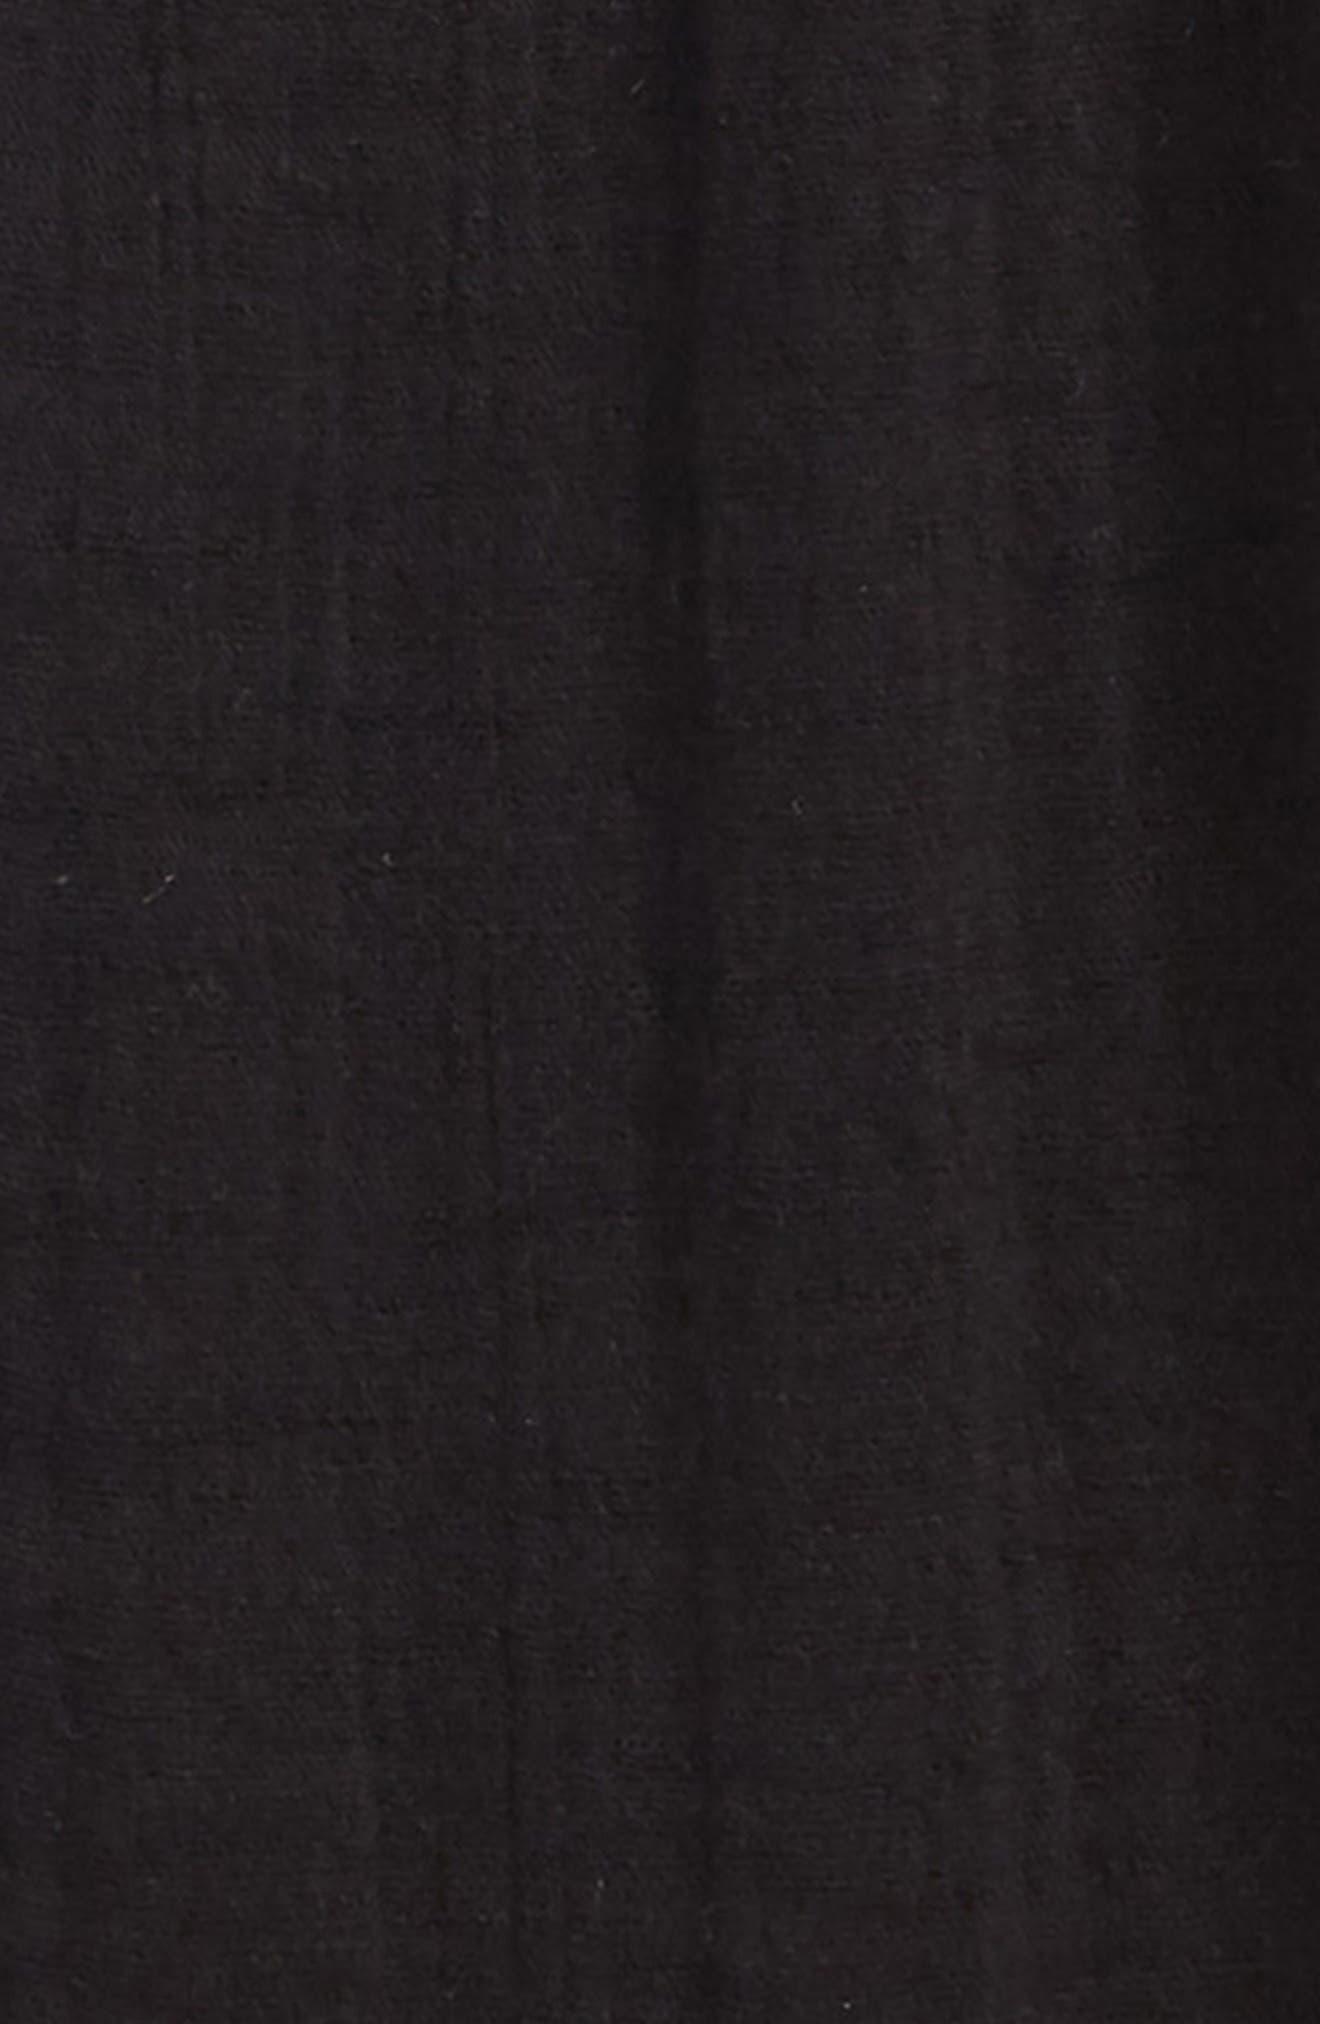 Textured Pocket Shorts,                             Alternate thumbnail 2, color,                             Black